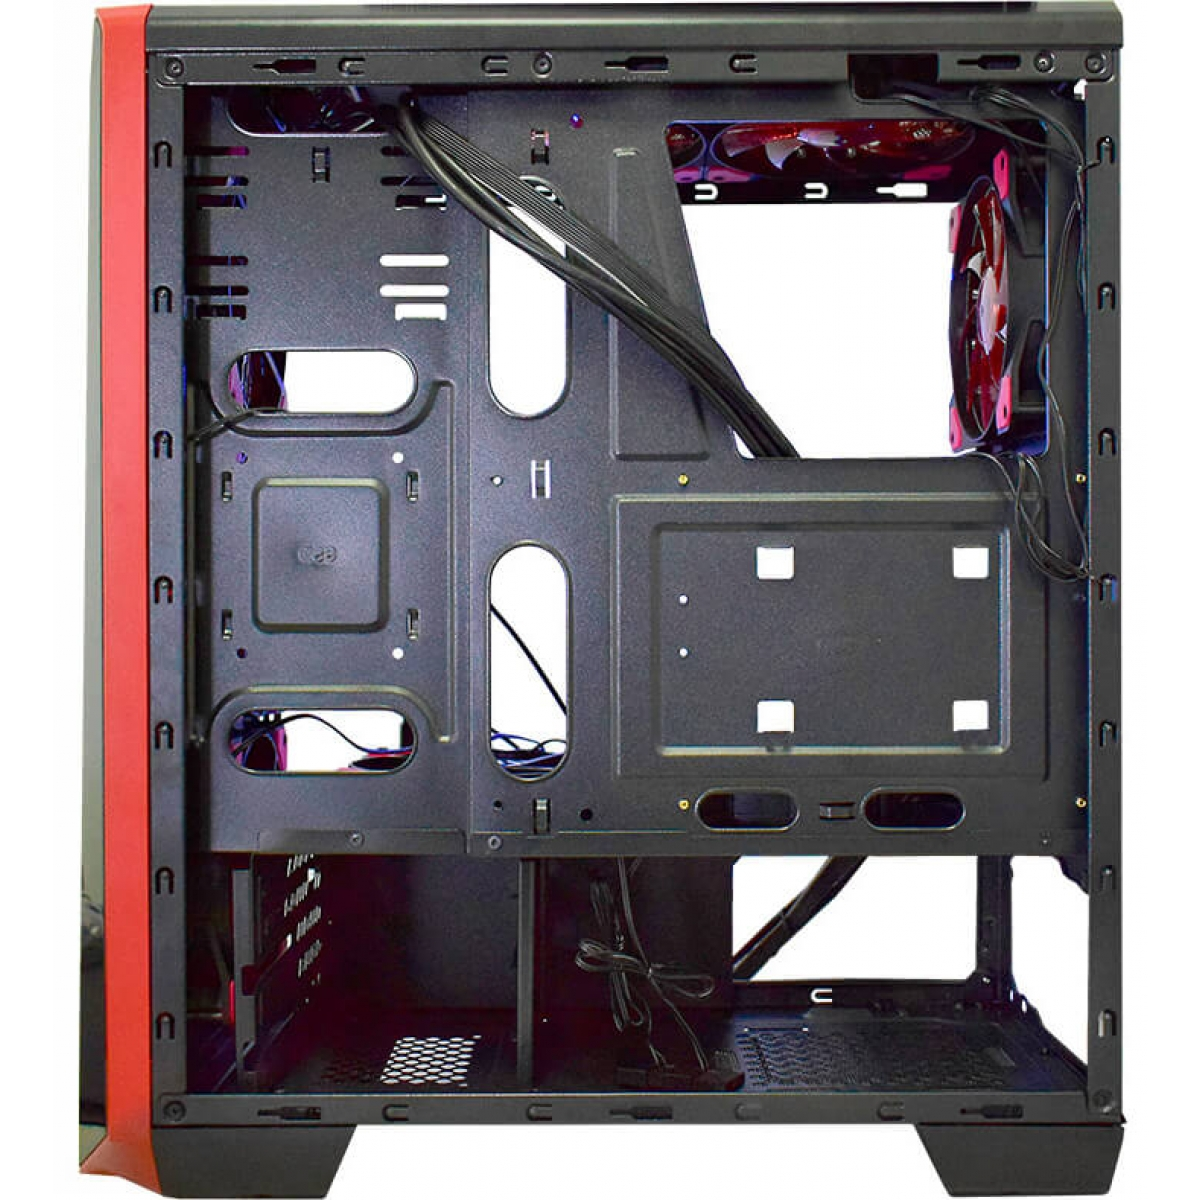 Gabinete Gamer K-mex Vamp, Mid Tower, Com 3 Fans Red, Lateral de Acrílico, Black. S-Fonte, CG-05P9